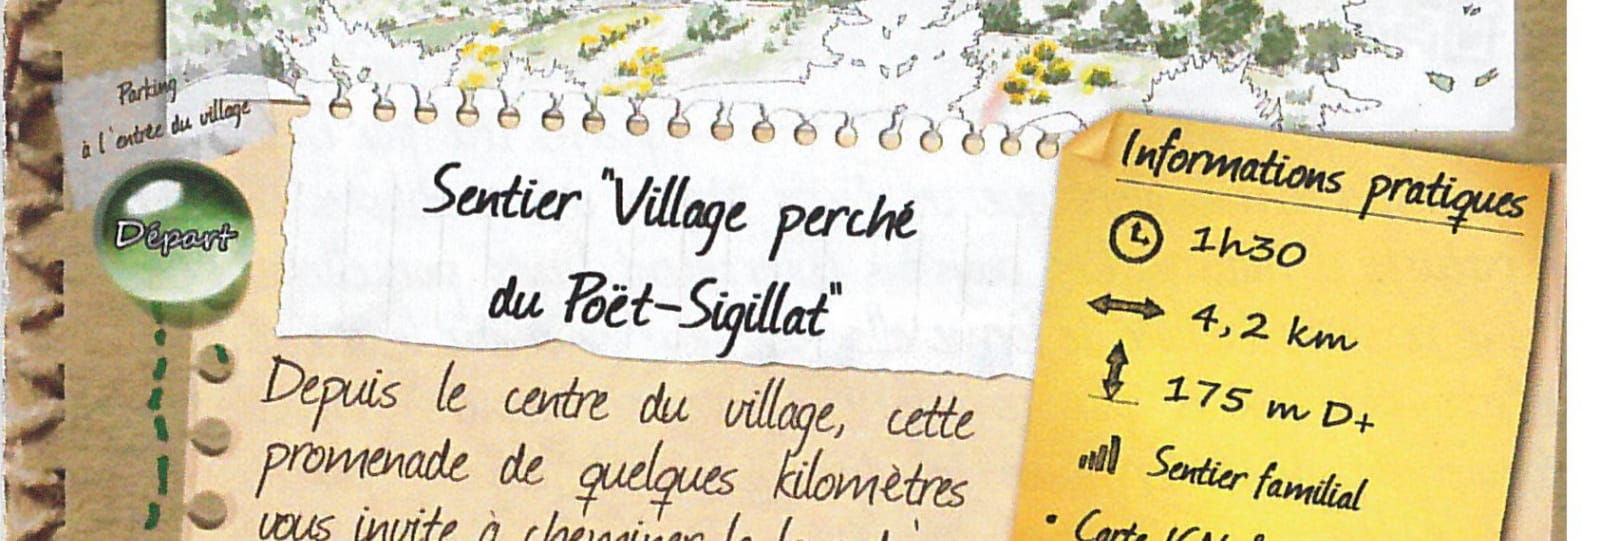 Village perché du Poët-Sigillat